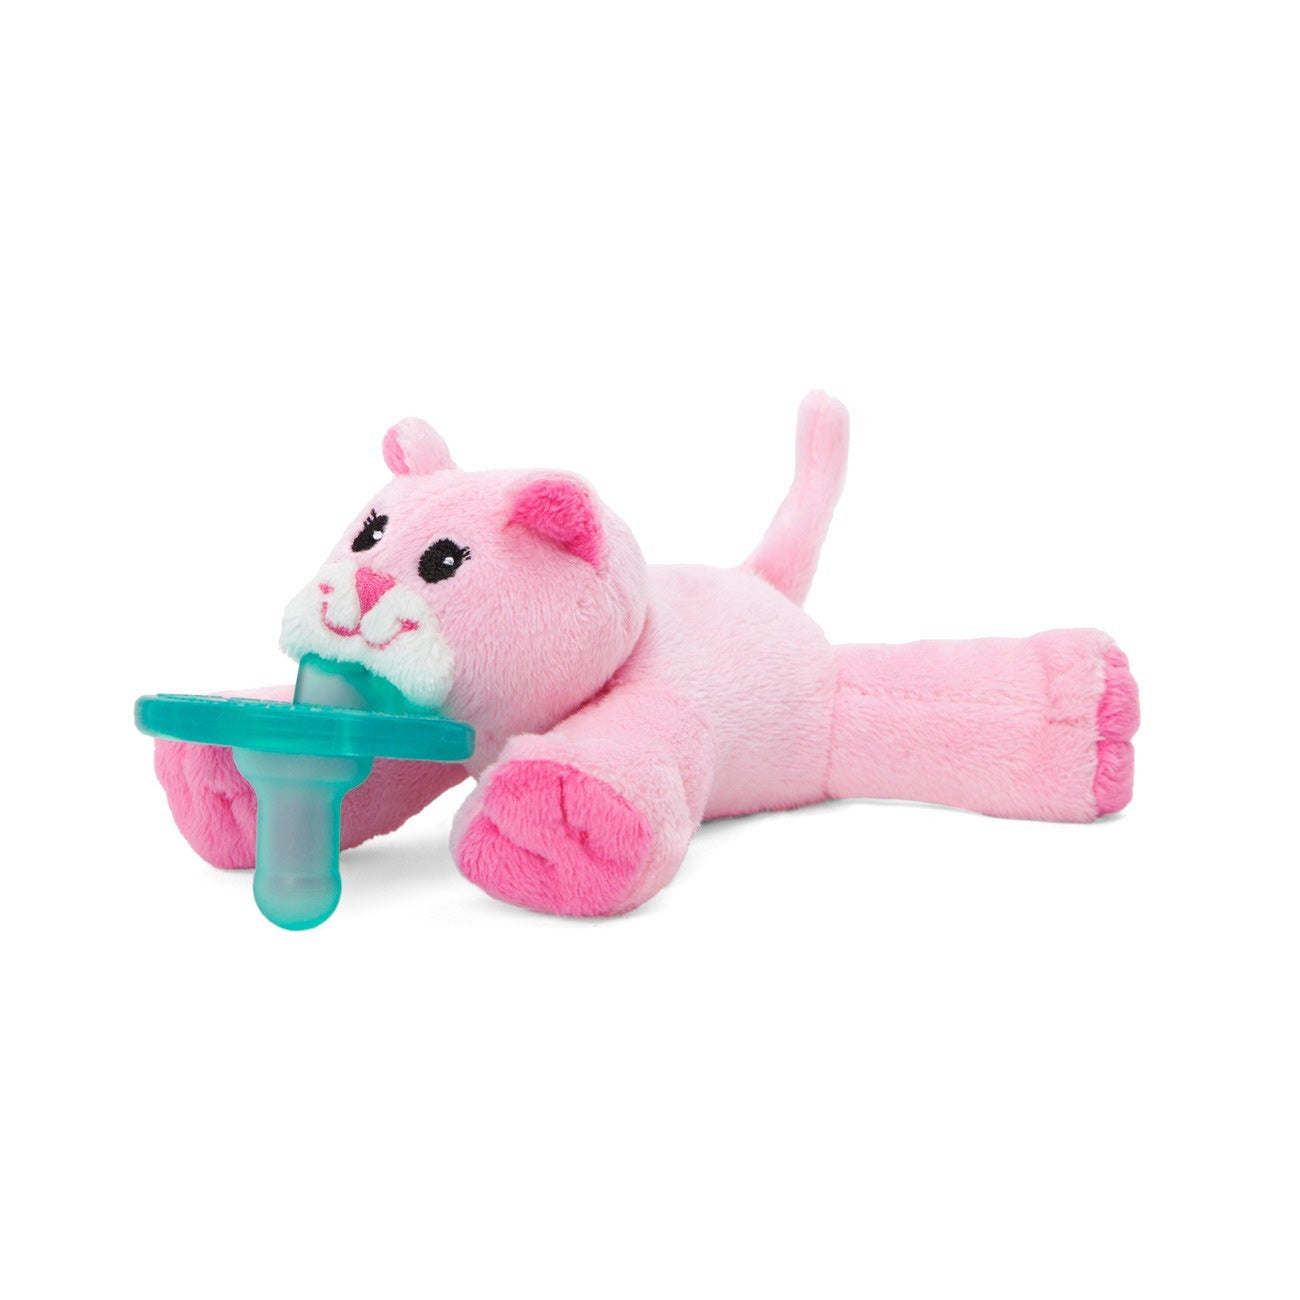 Wubbanub Pink Kitty Infant Pacifier (Pink Kitty)